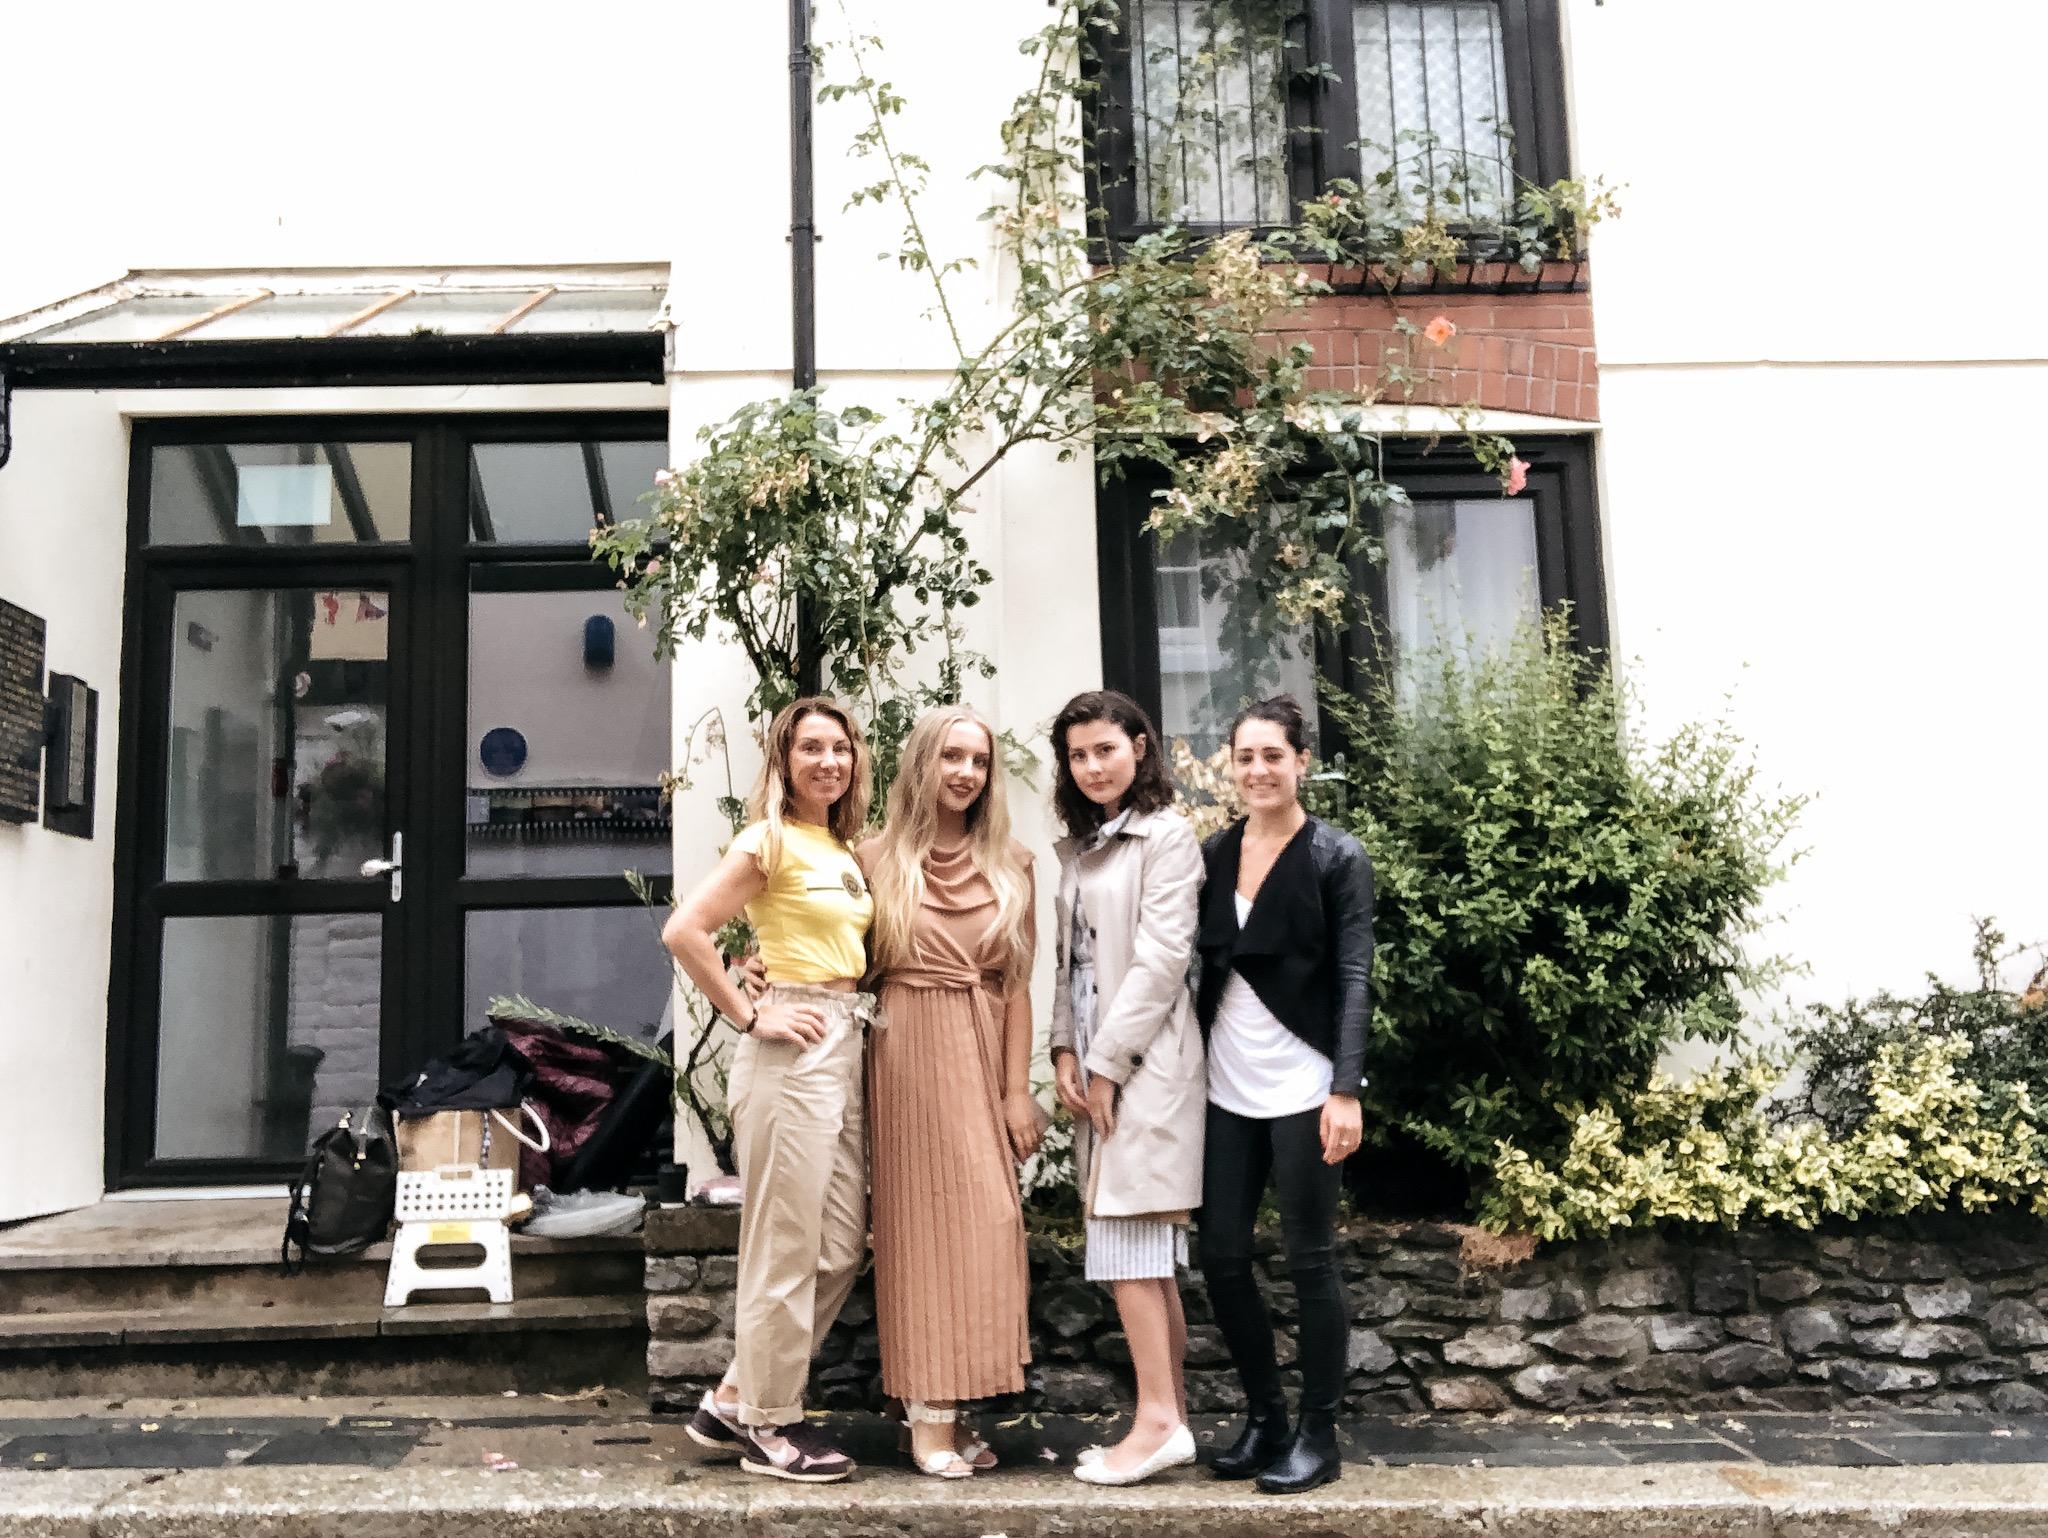 emma barrow editorial dolly fashion photography team behind the scenes